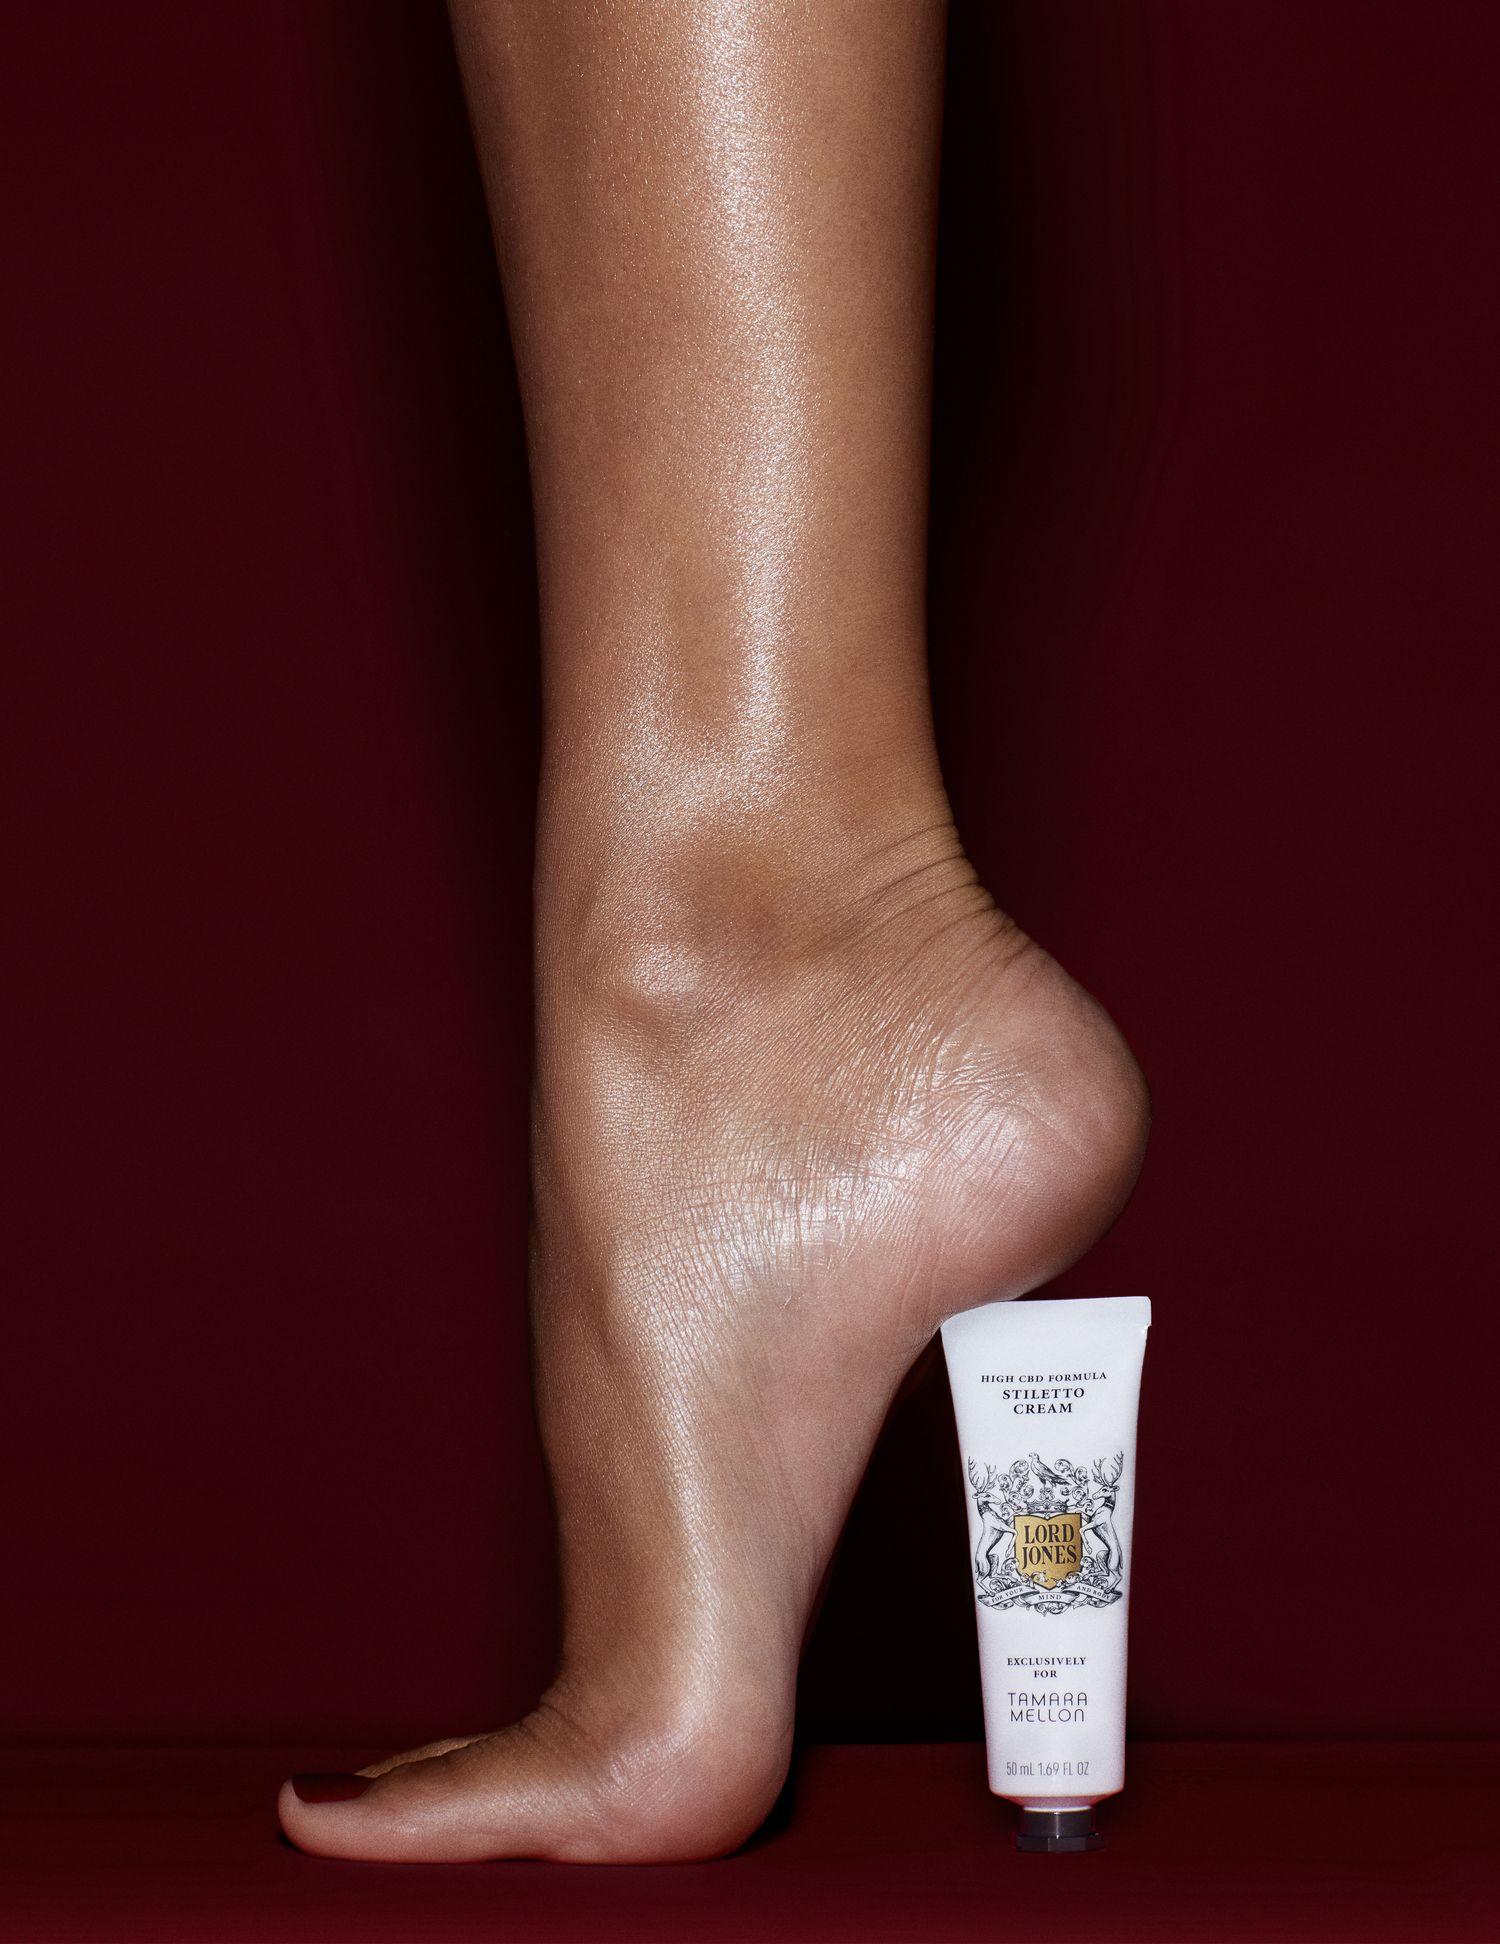 Lord Jones and Tamara Mellon Created a CBD Cream for High-Heel Lovers